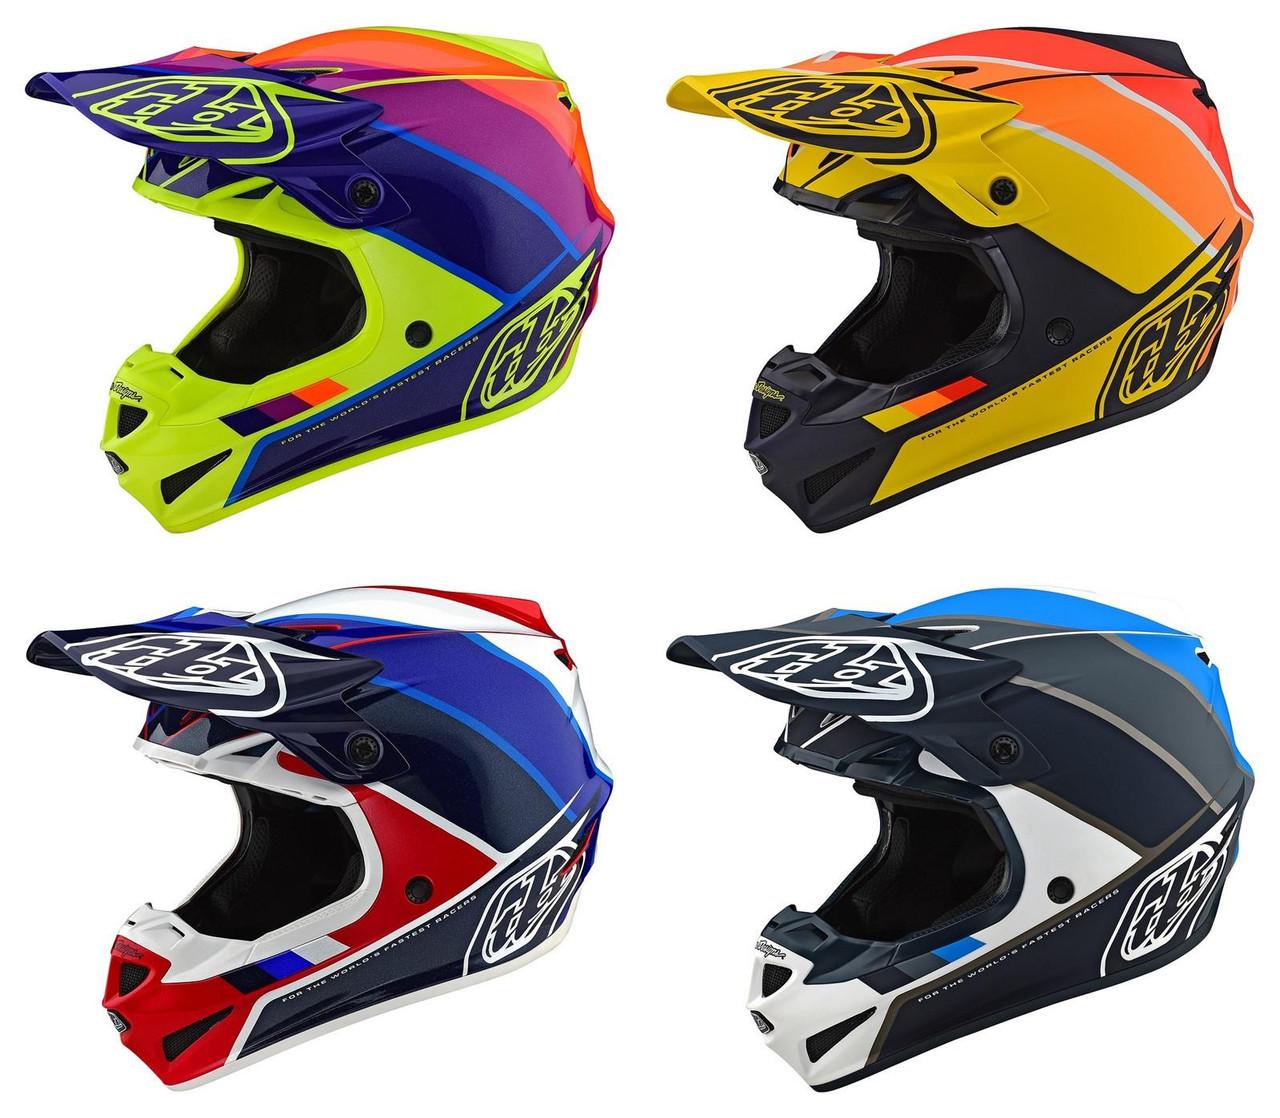 2019 Troy Lee Designs TLD Adult SE4 Polyacrylite Factory Helmet Yellow MX Moto